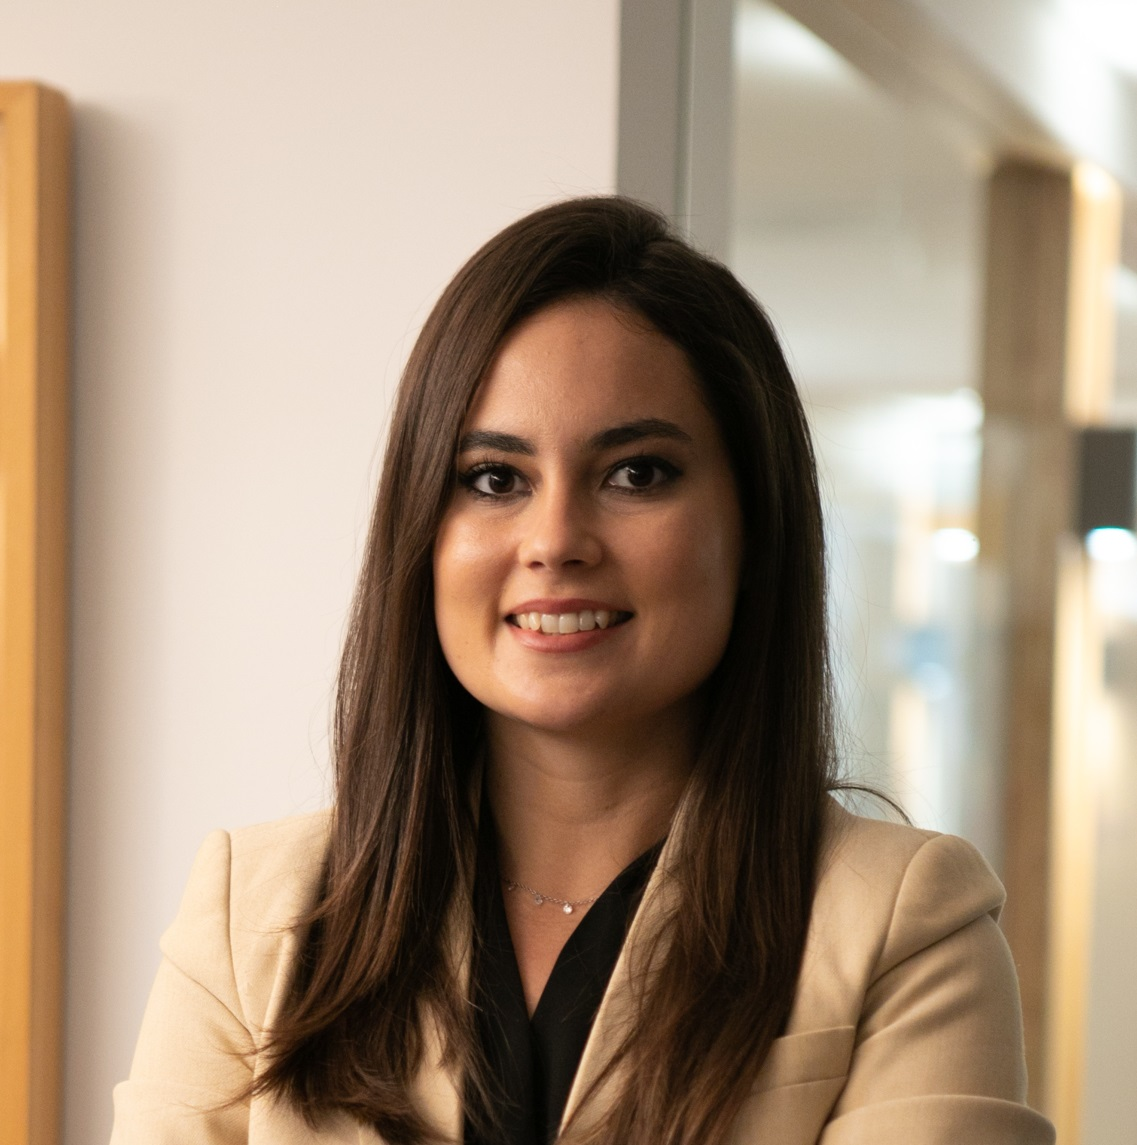 Mª Dolores  Jiménez Guerrero